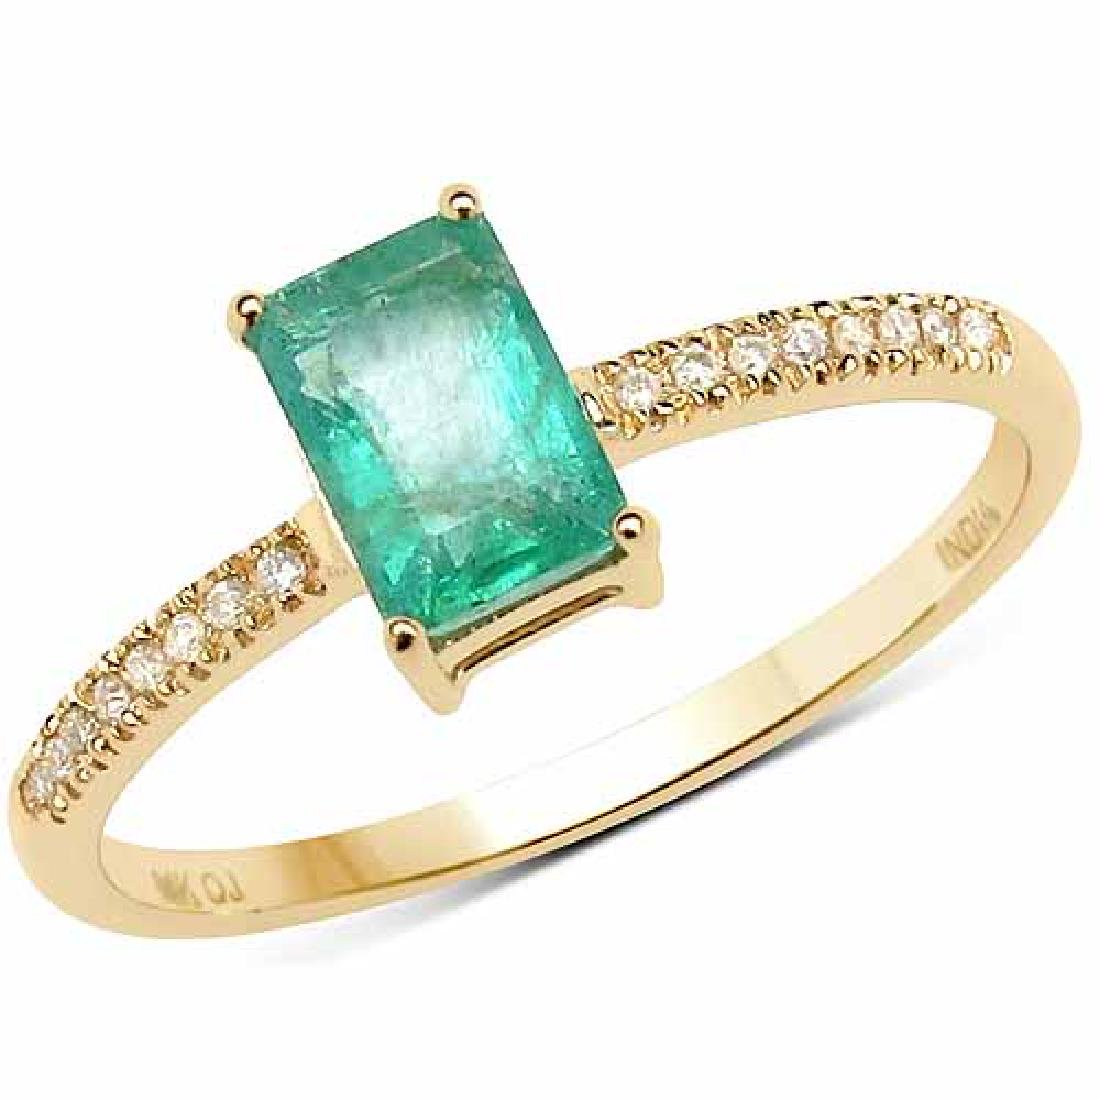 0.60 Carat Genuine Zambian Emerald and White Diamond 14